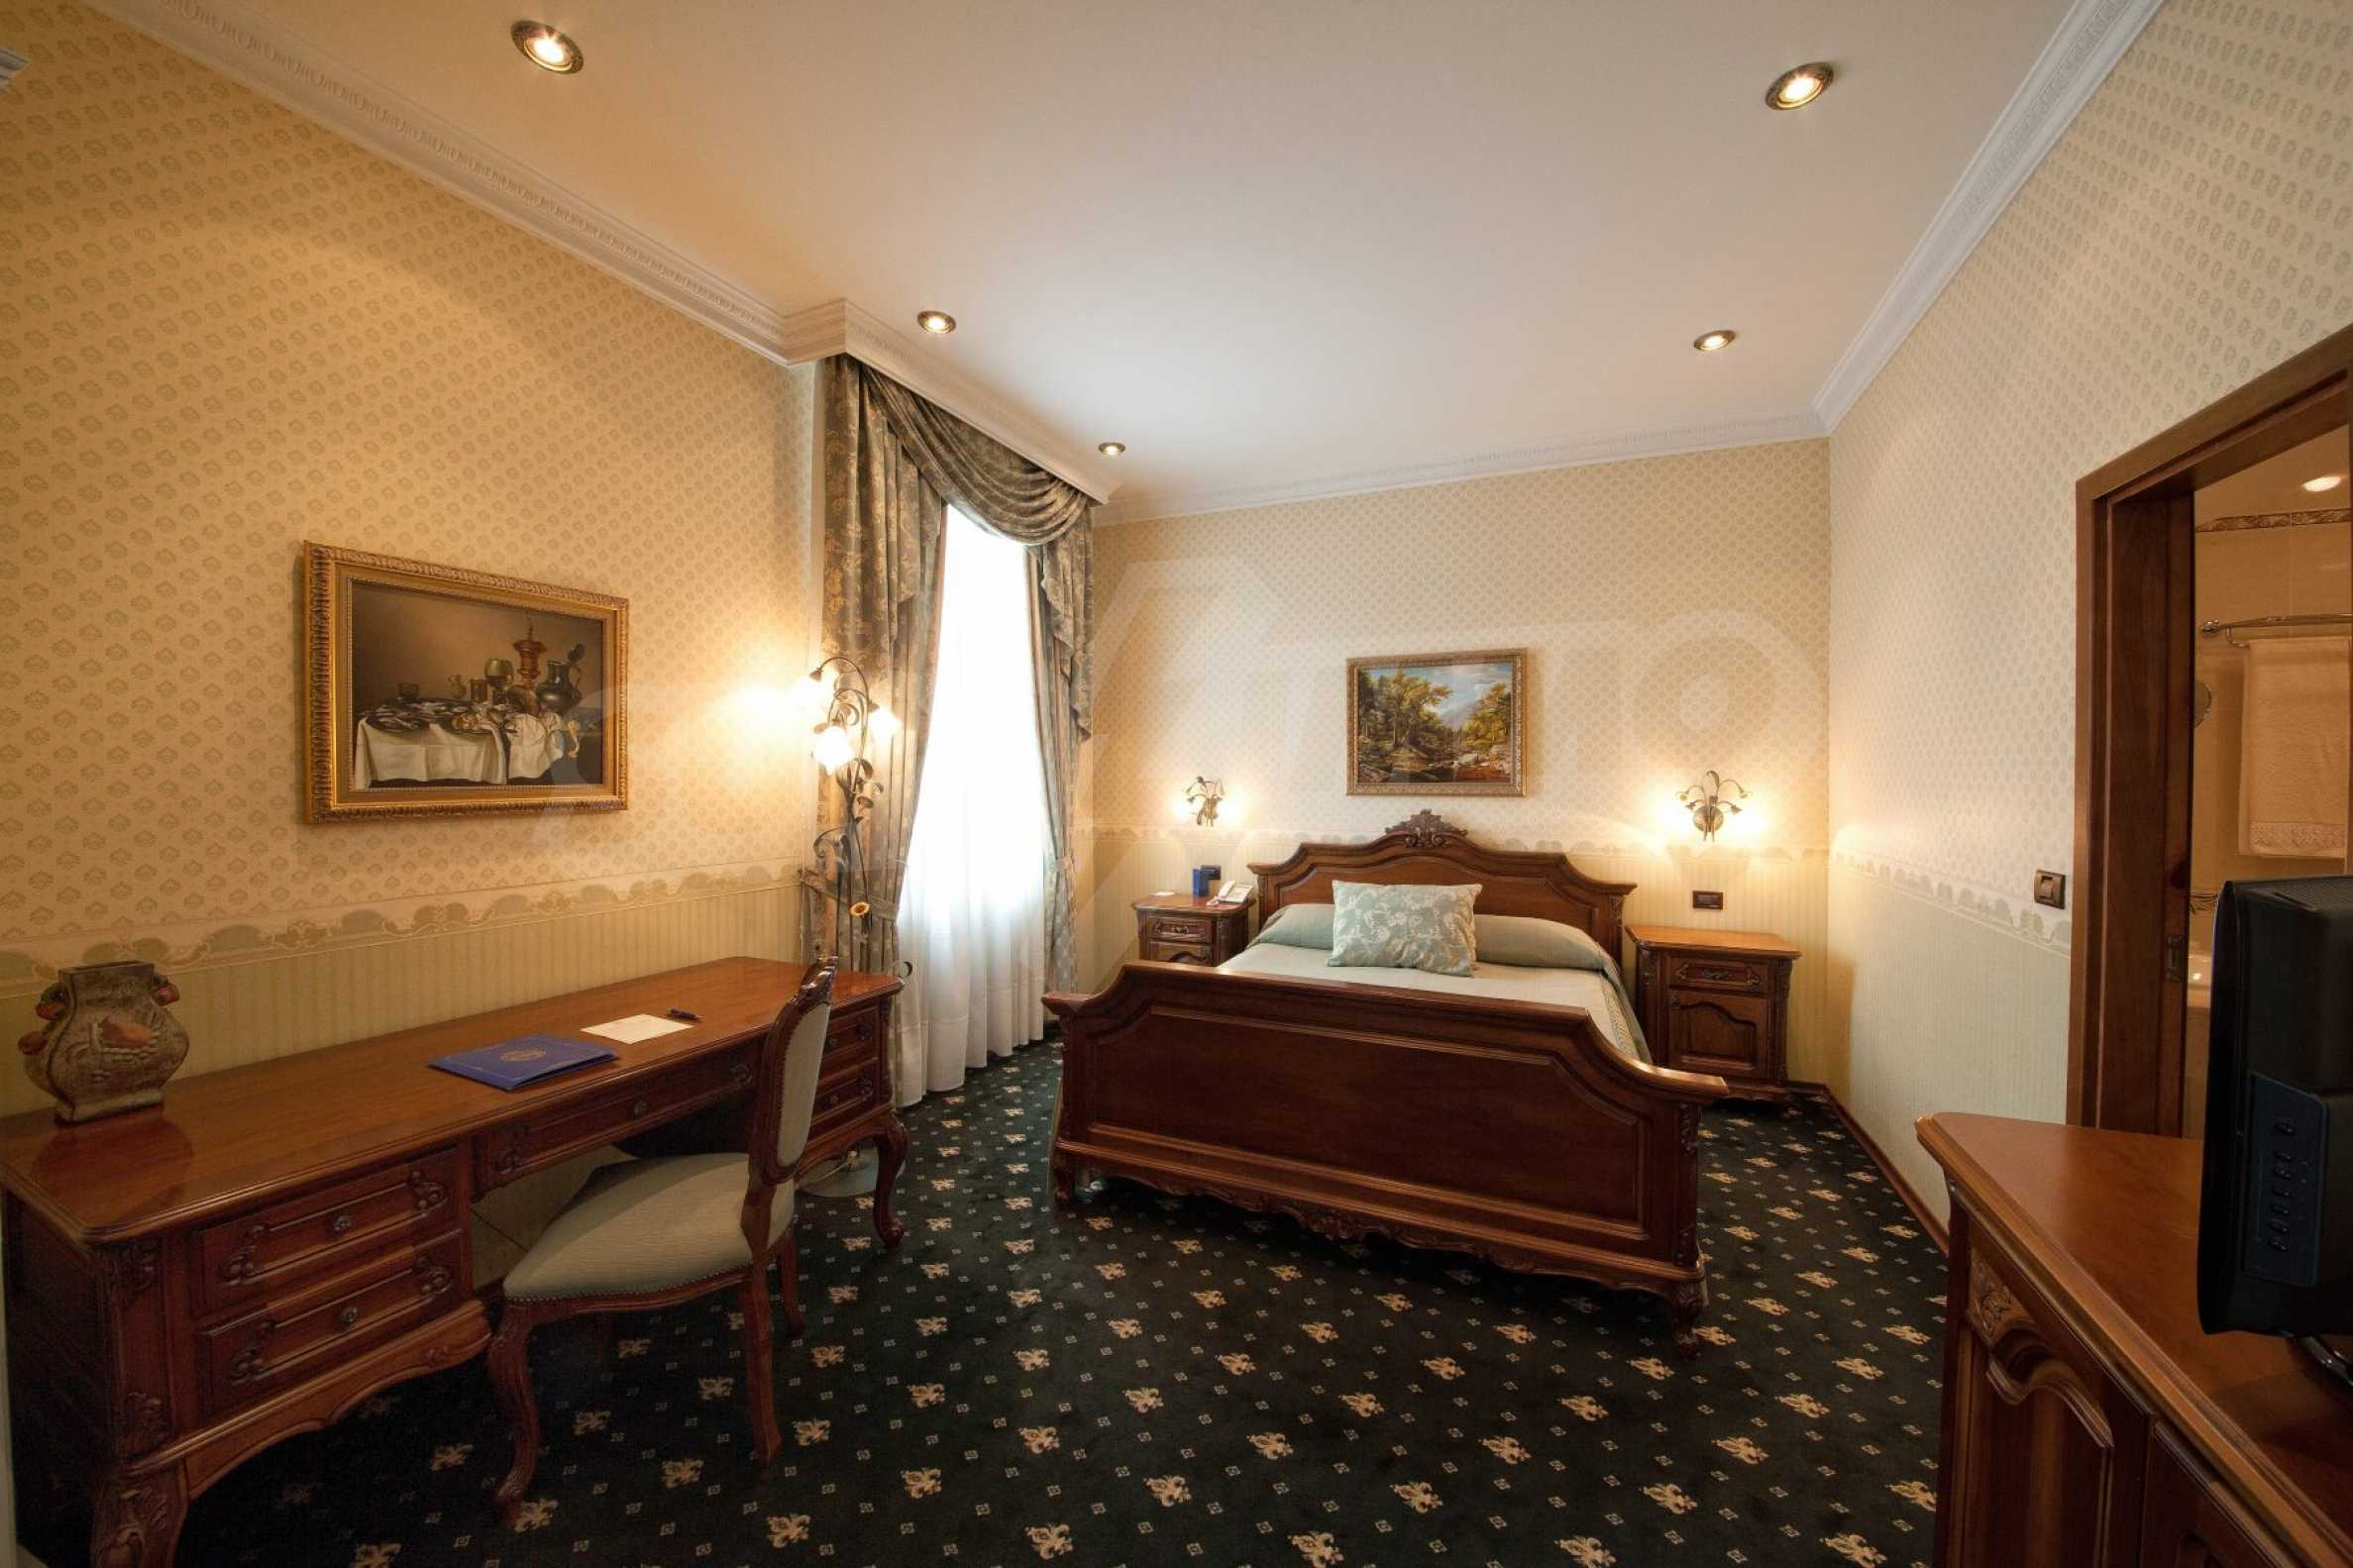 Fünf-Sterne-Hotel 1